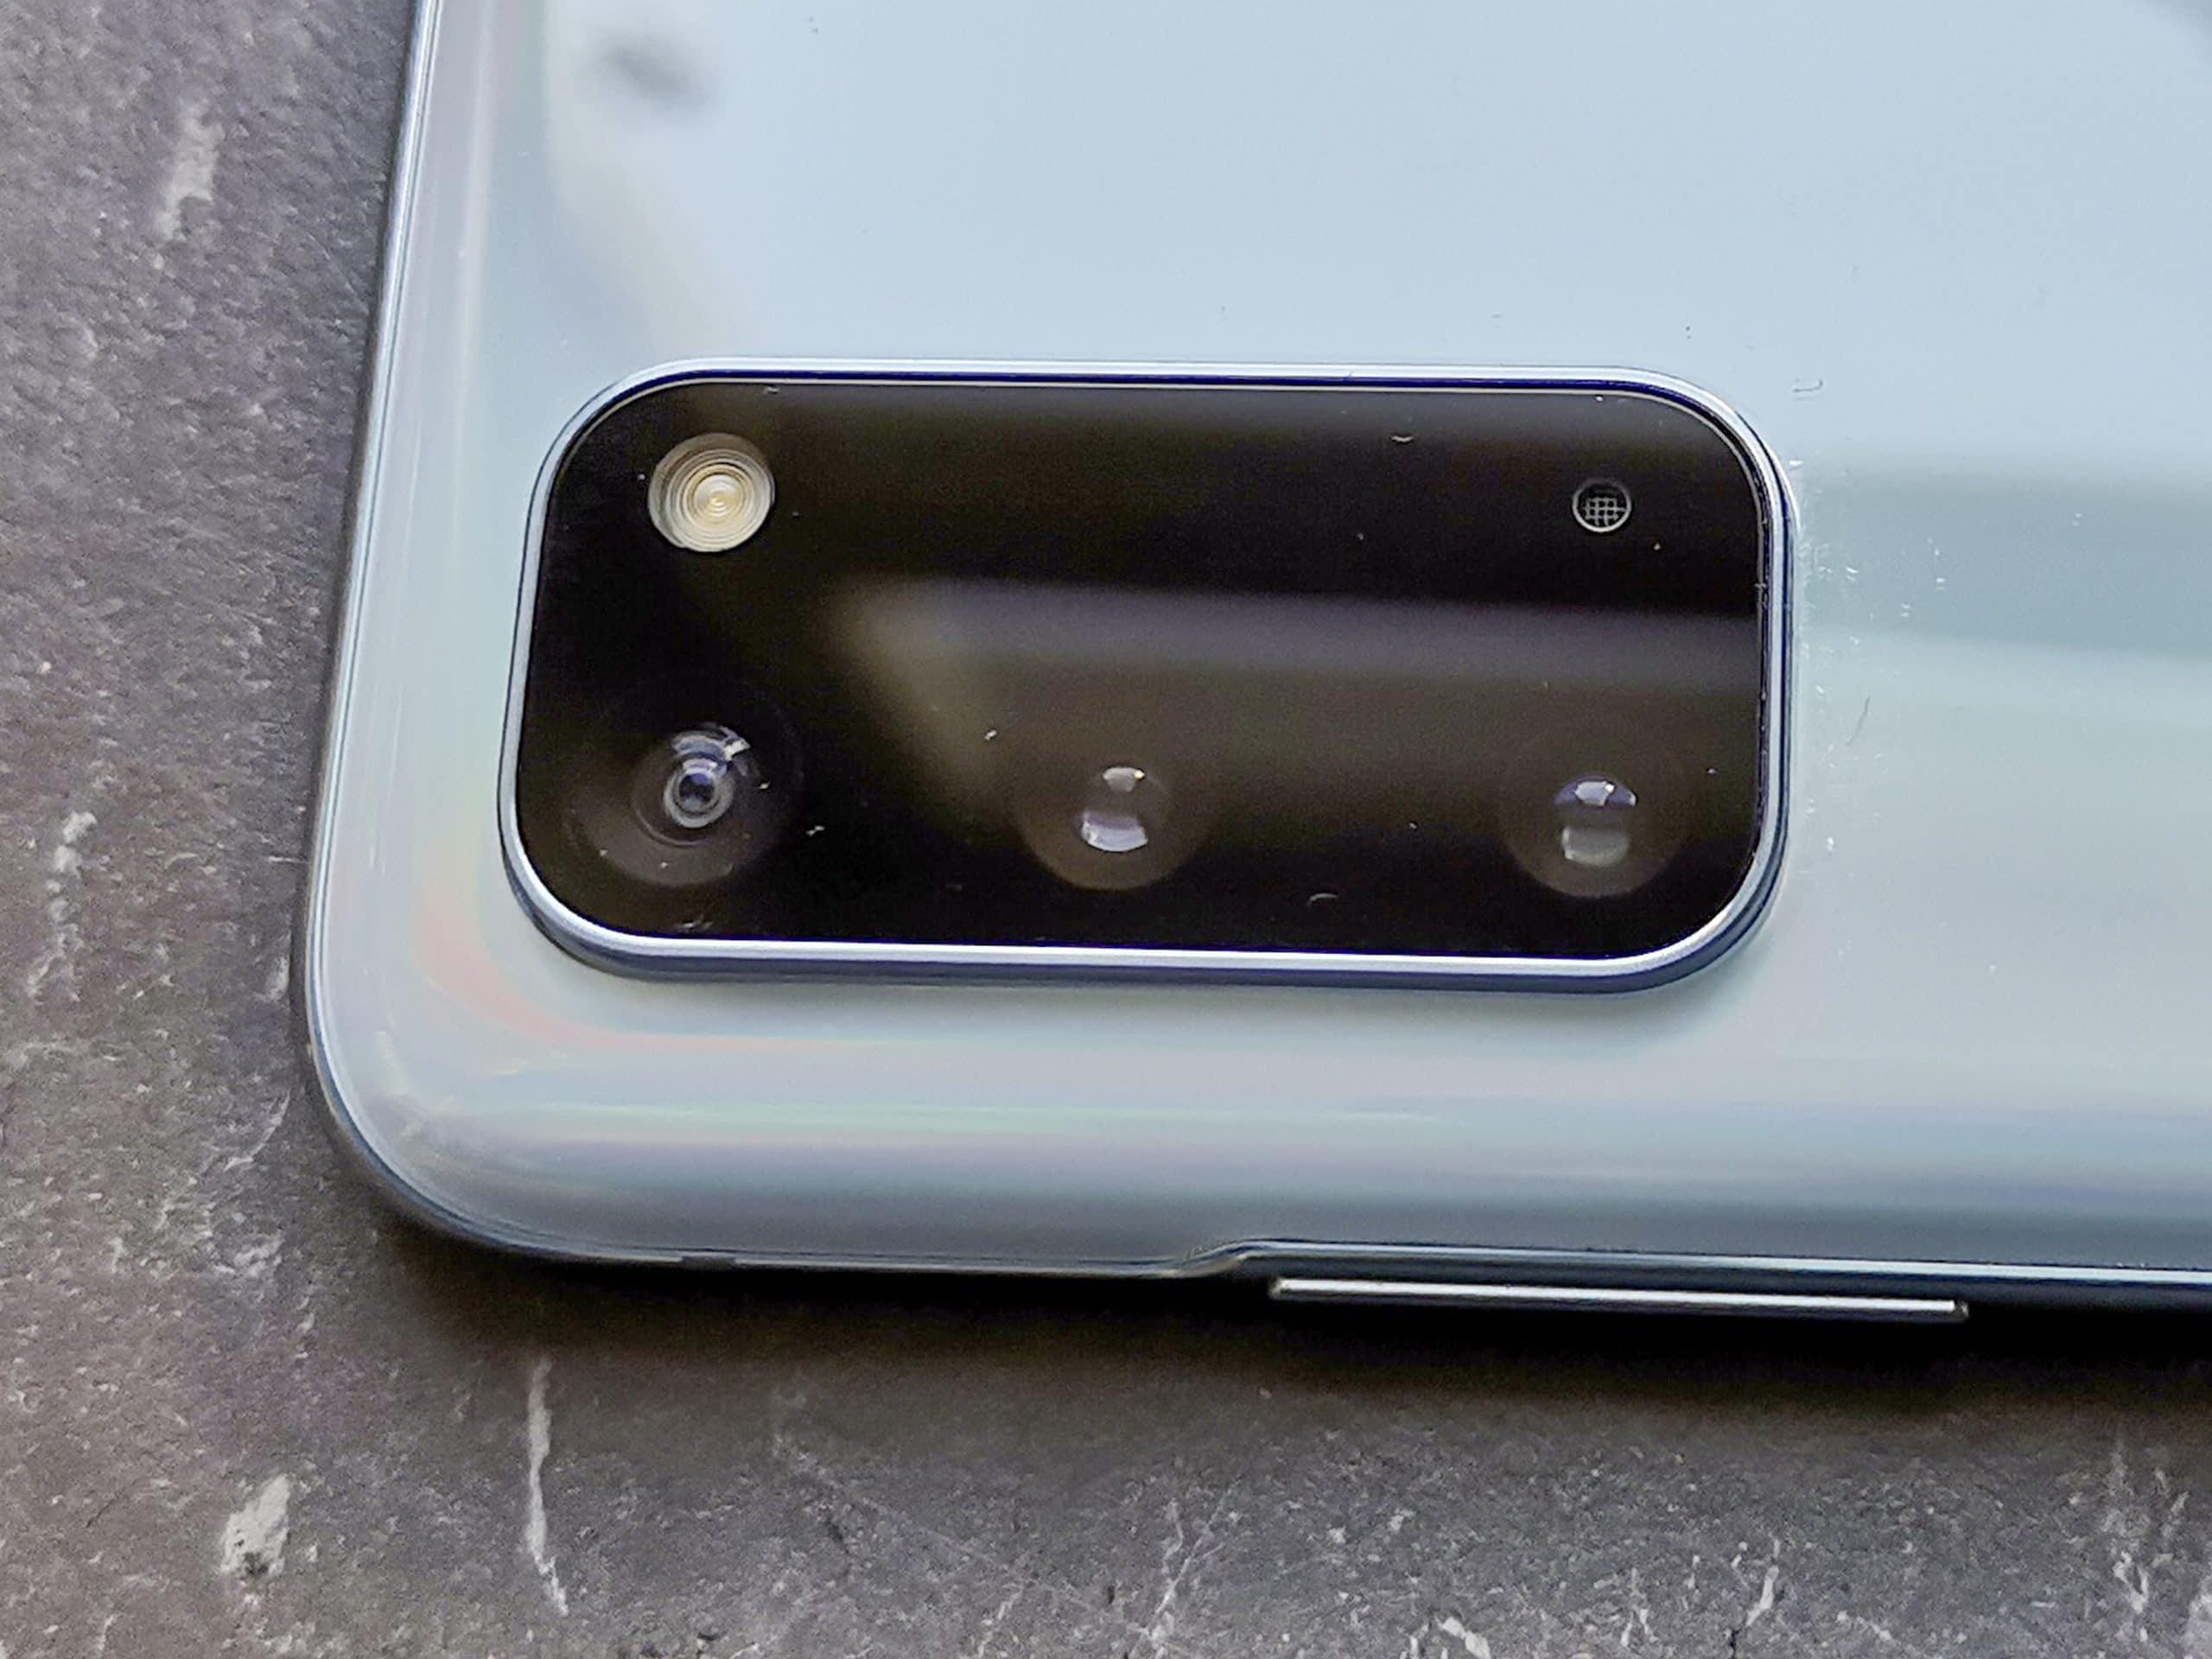 Samsung Galaxy S20 Kamera